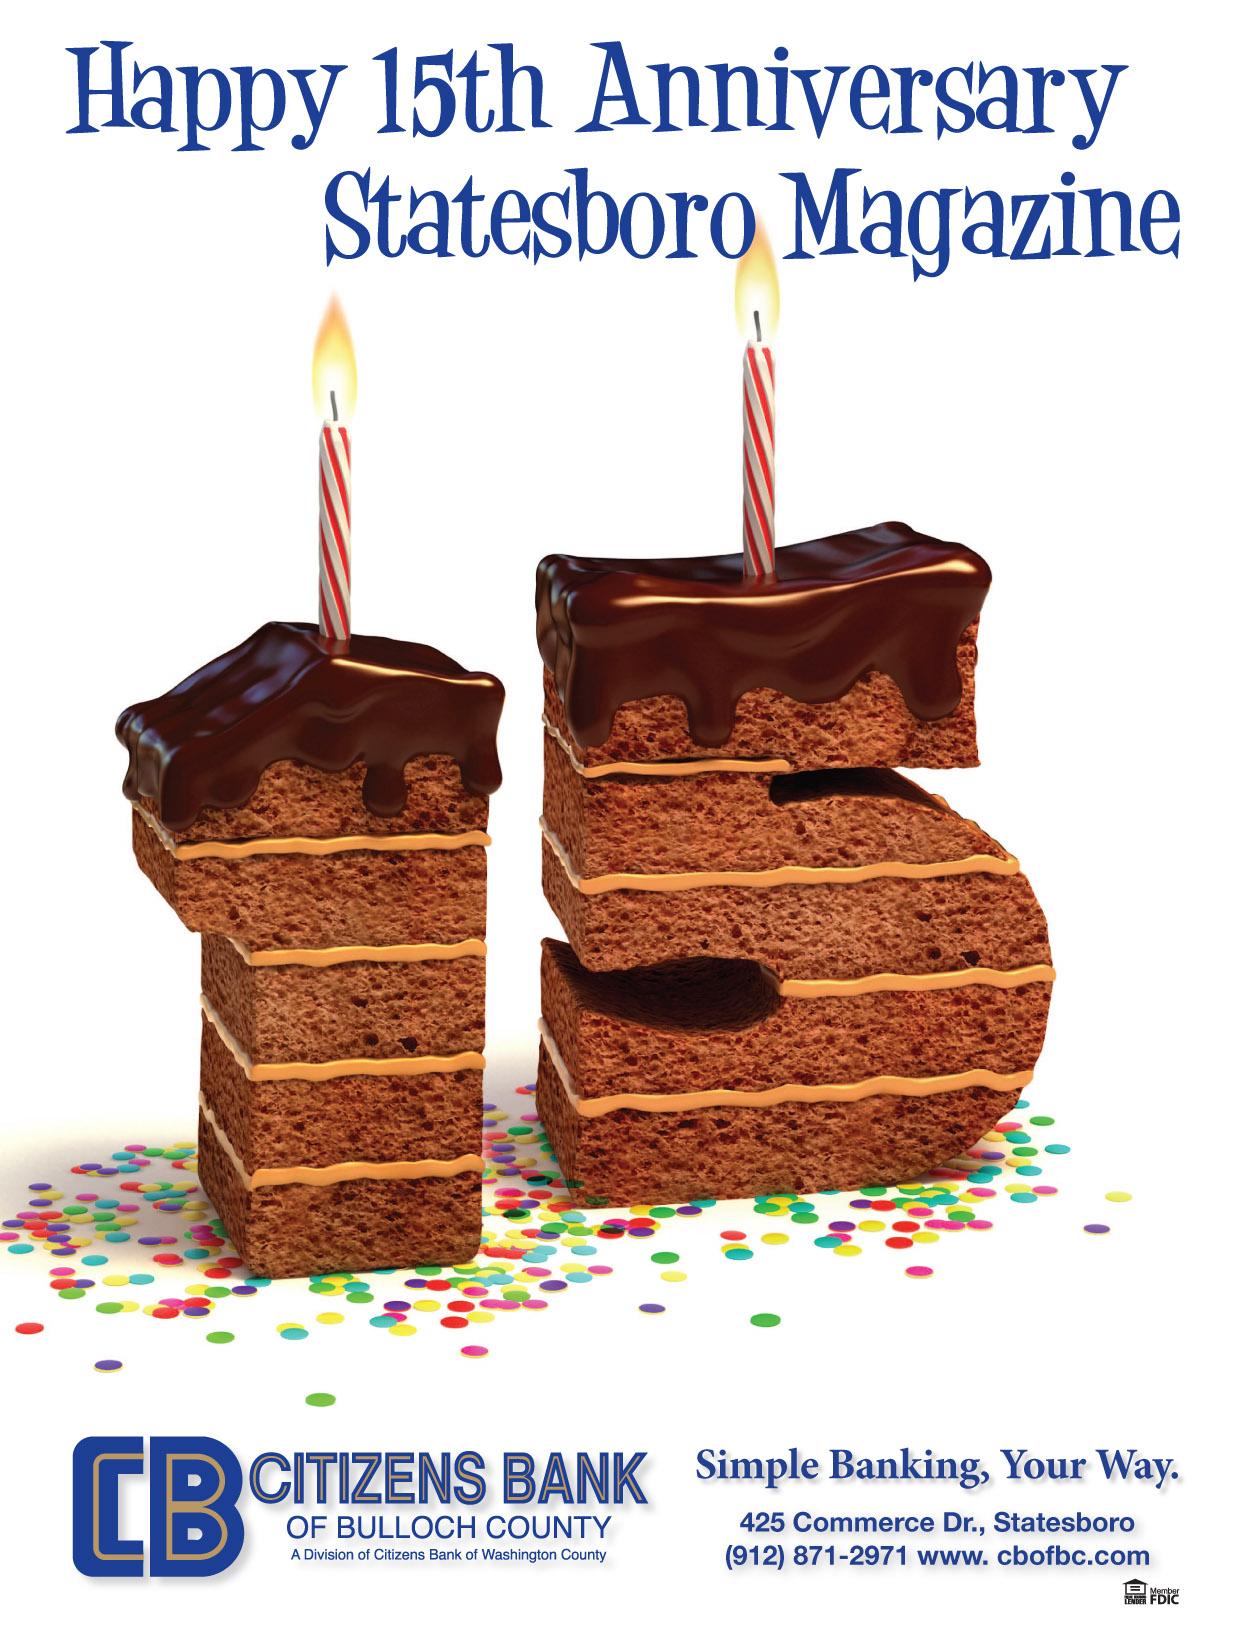 StatesboroMagazine 4_2014b.jpg